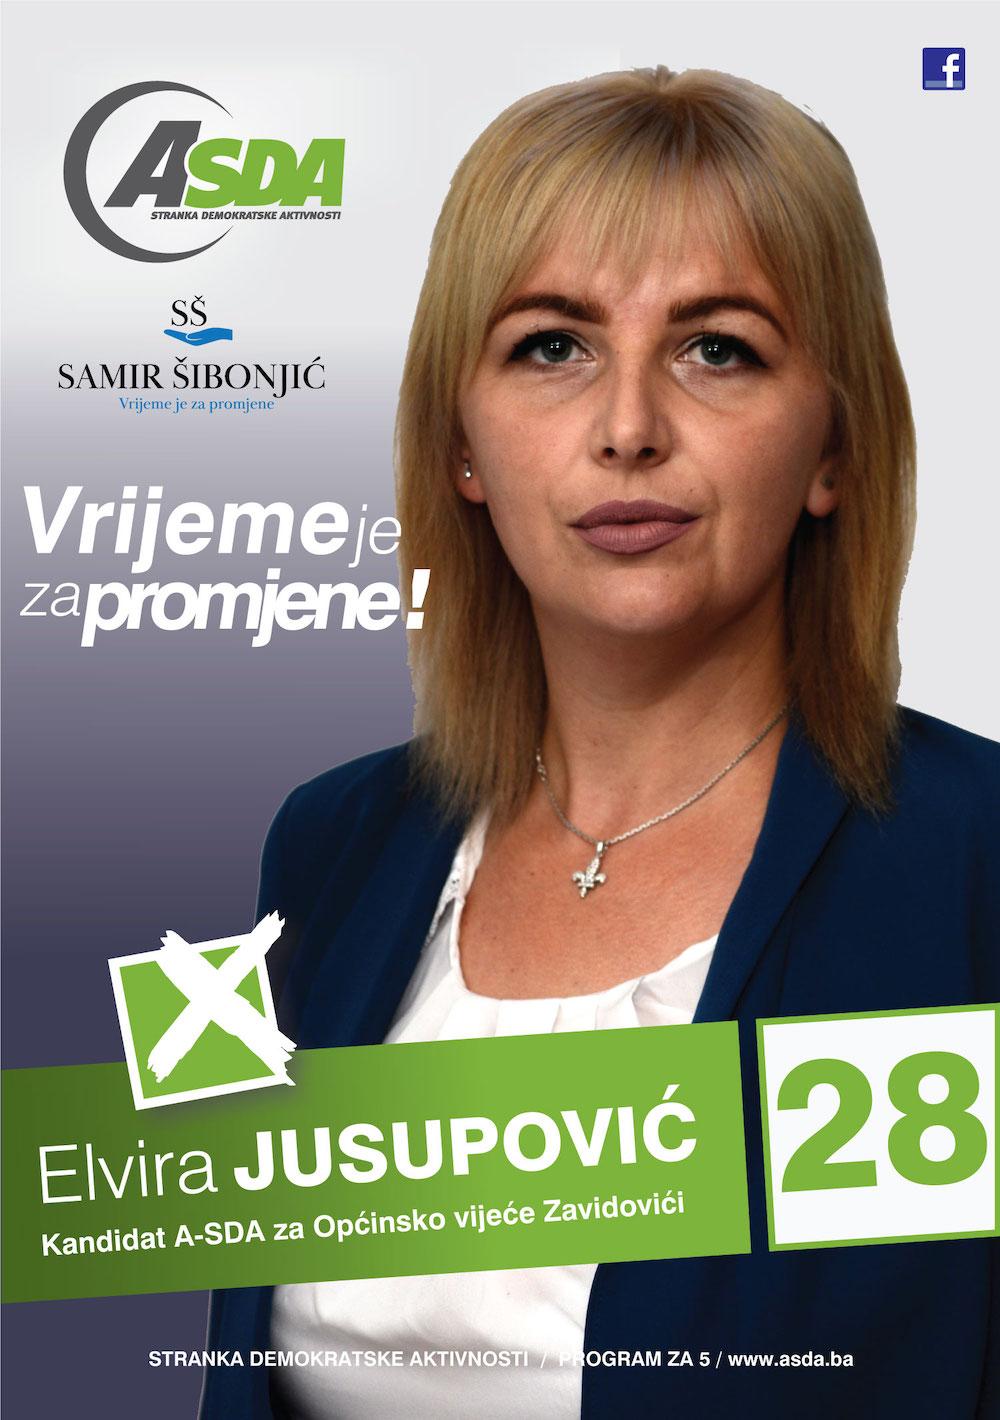 Elvira Jusupović